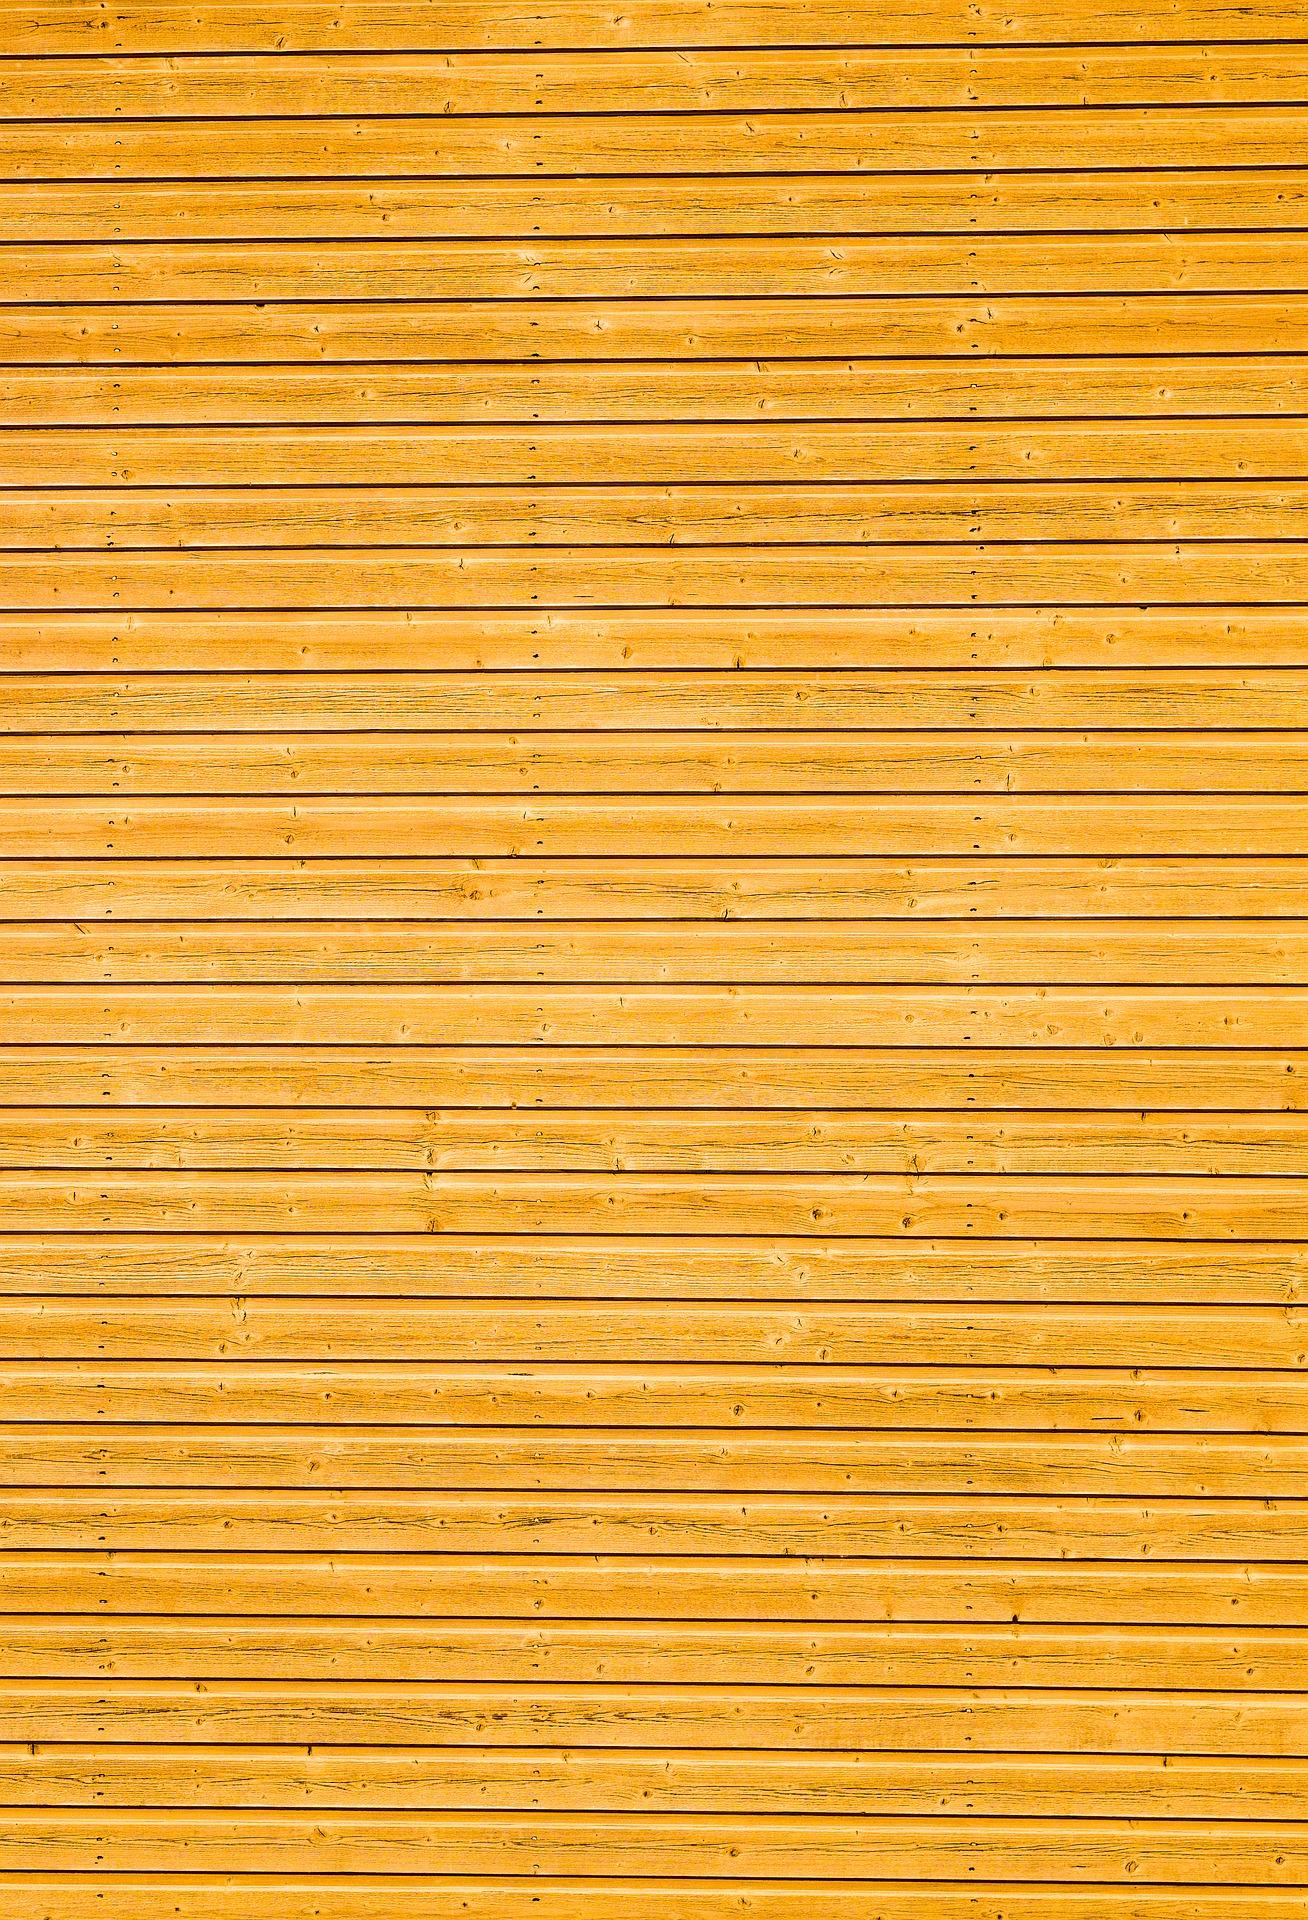 Wooden Wallpaper, Design, Texture, Wallpaper, Wood, HQ Photo